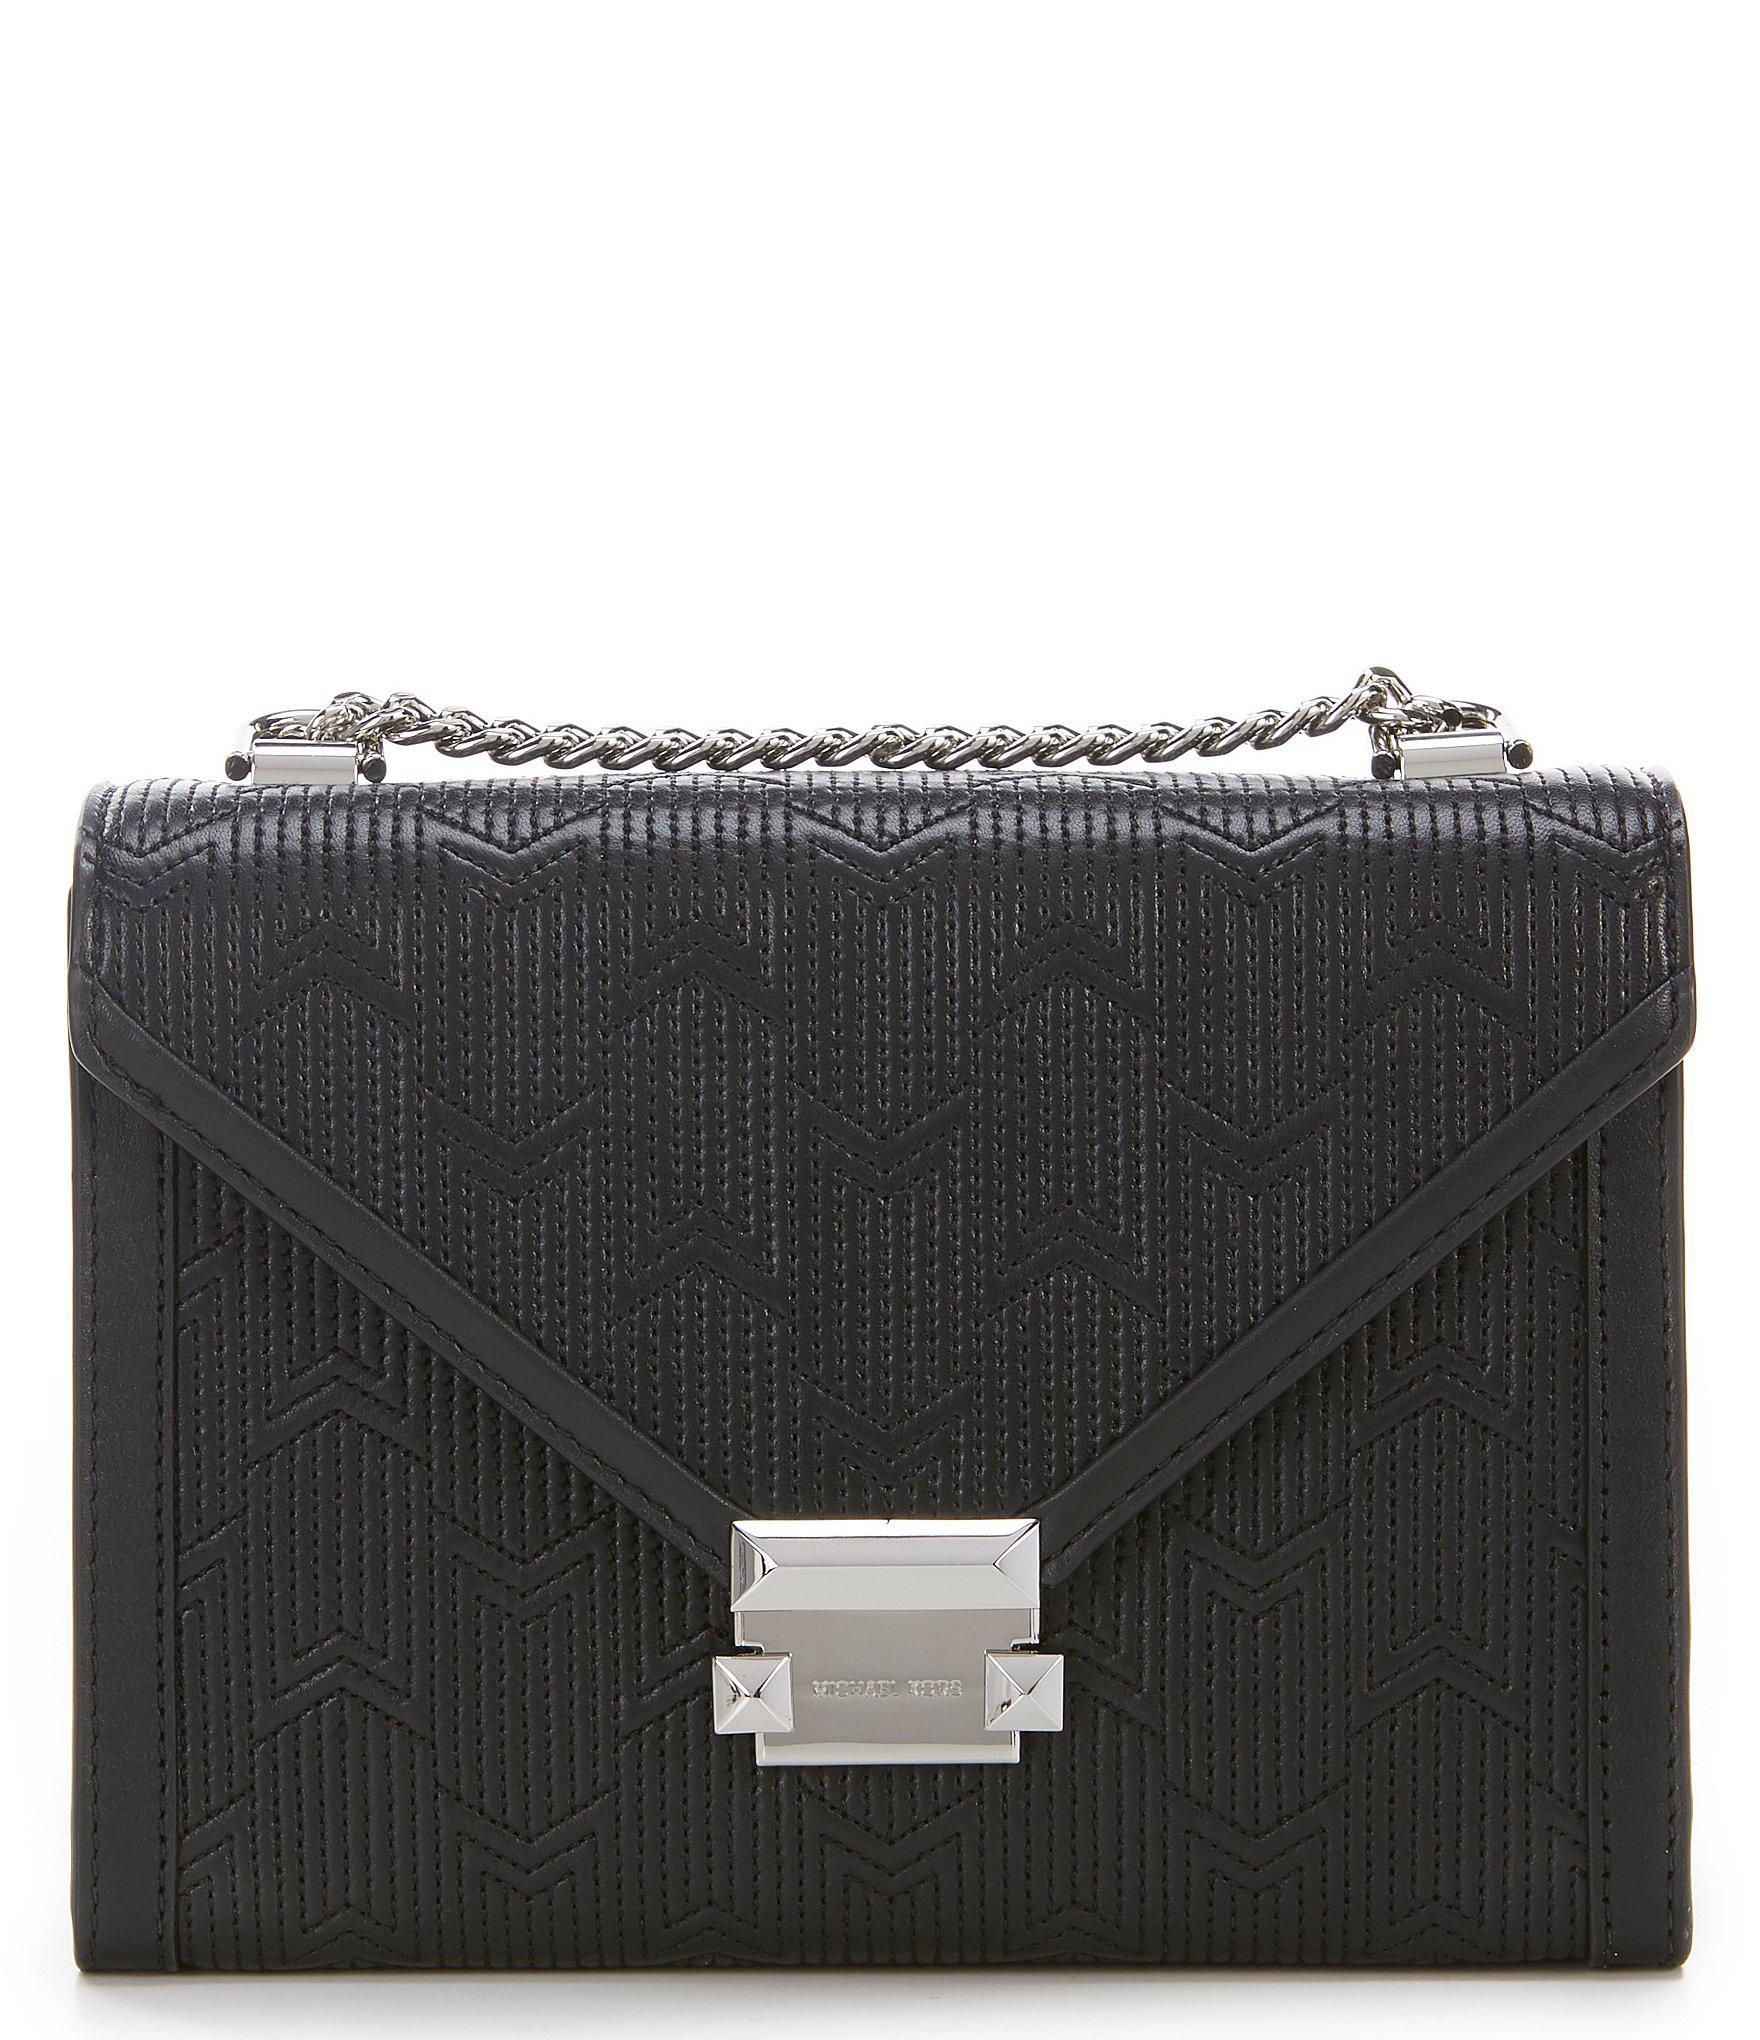 18f754ea31d6 Lyst - MICHAEL Michael Kors Whitney Large Quilted Shoulder Bag in Black